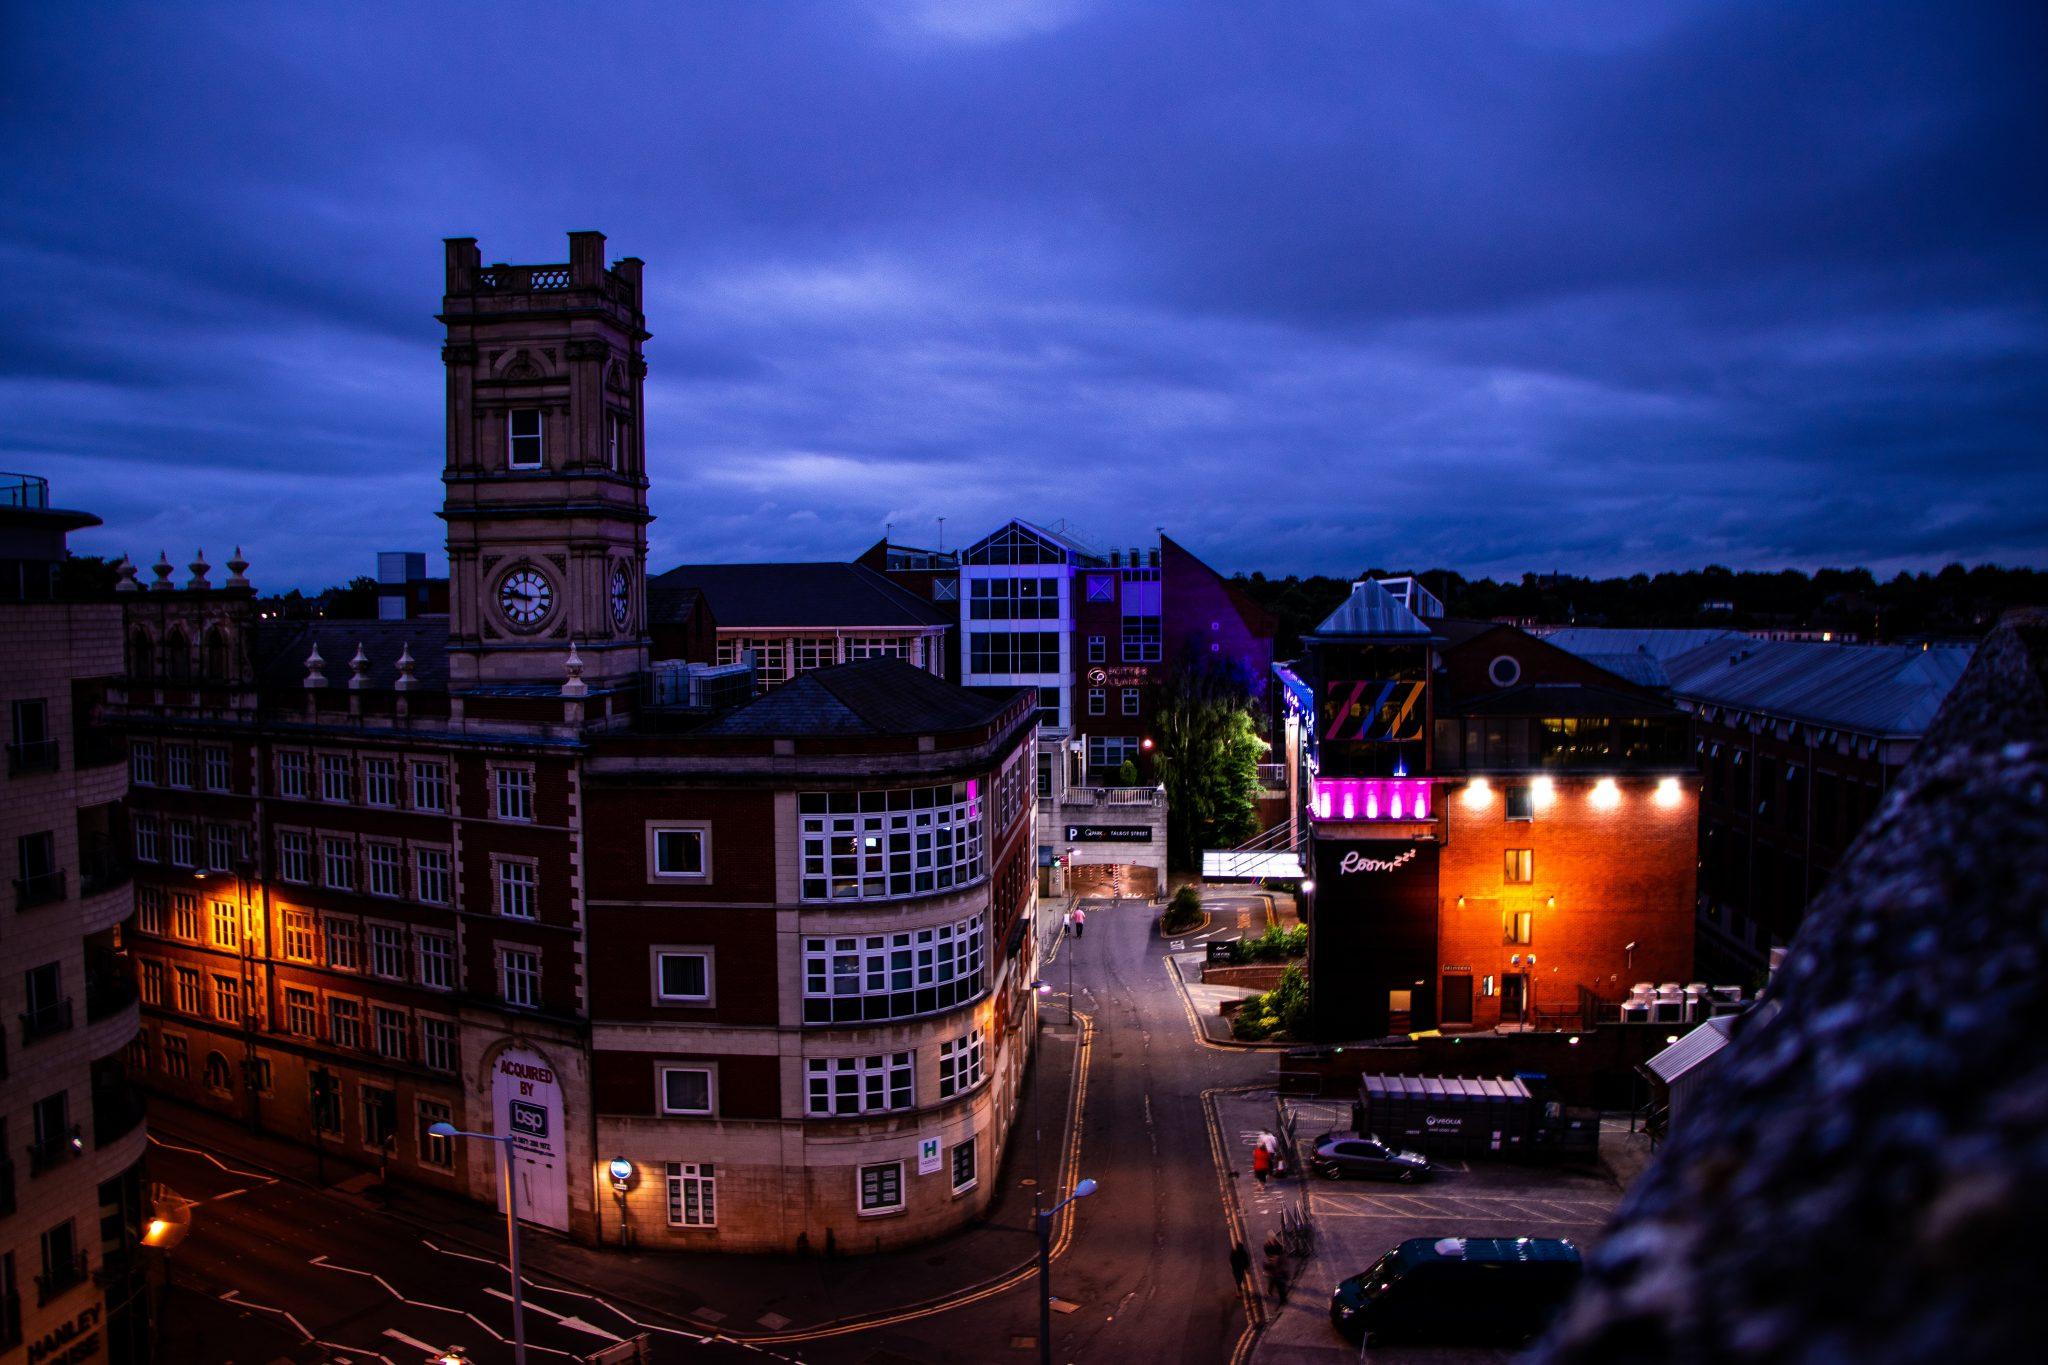 Nottingham CCTV Row Image